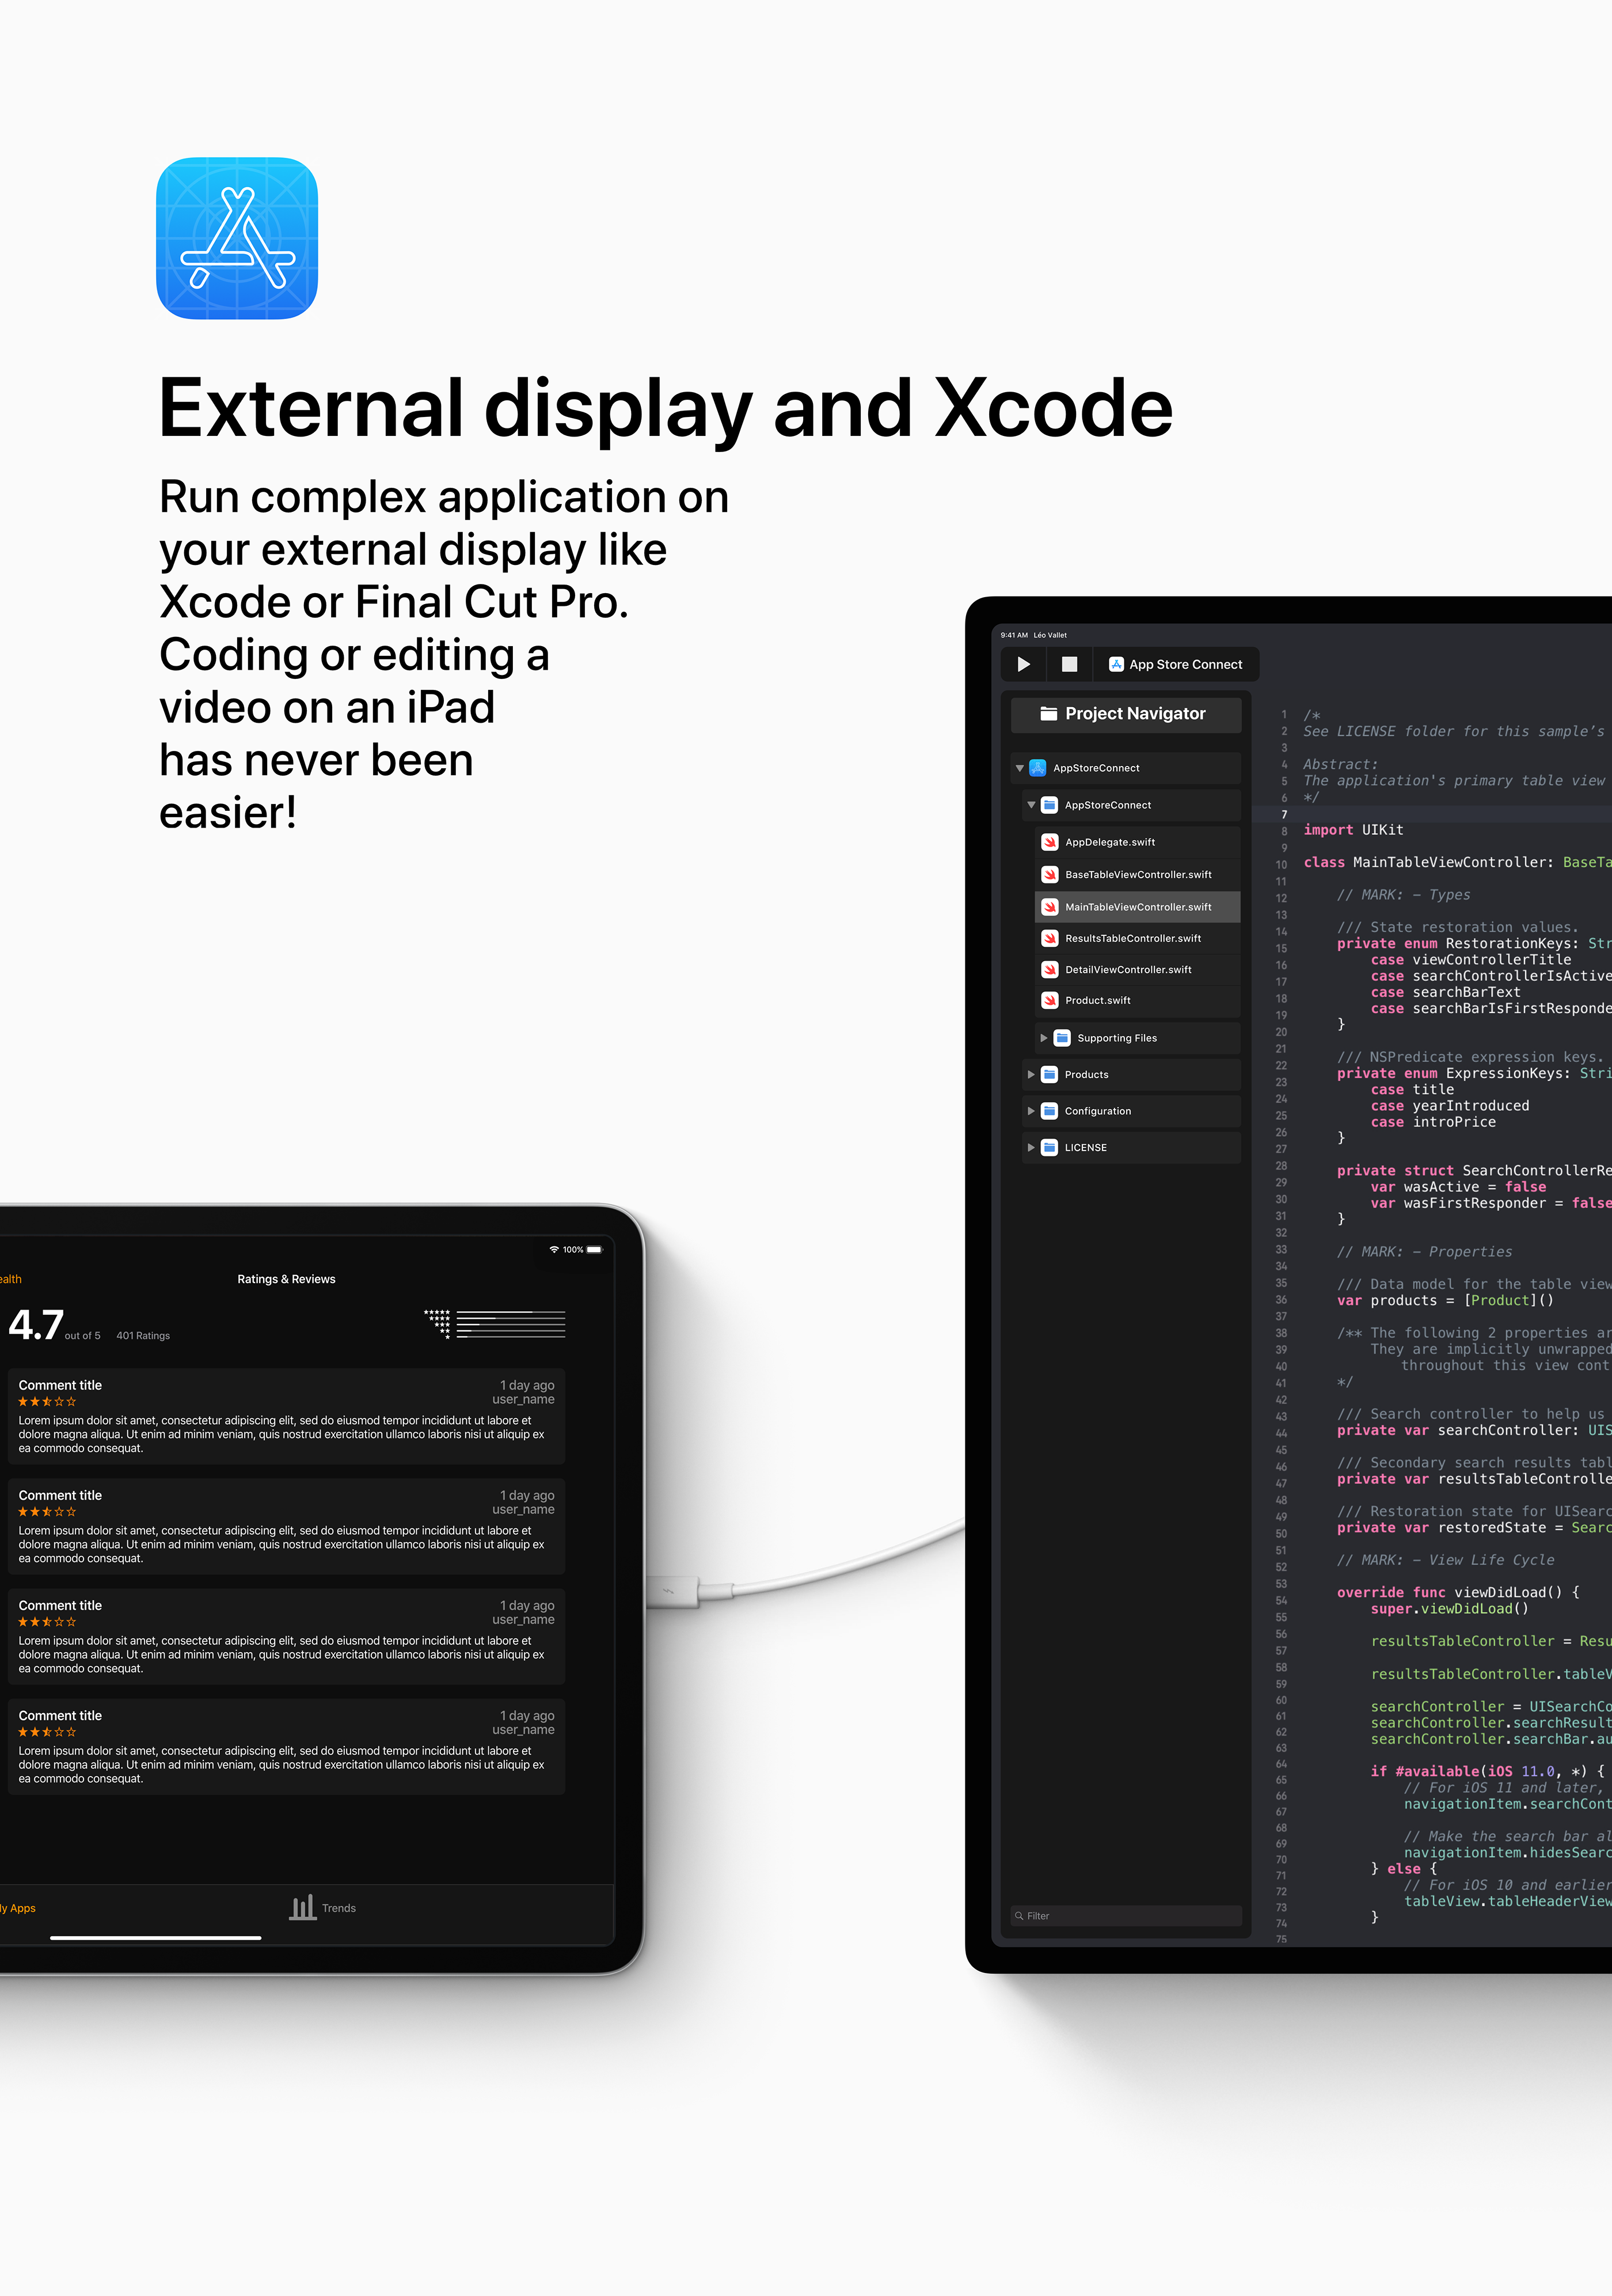 iOS concept iPad external display support